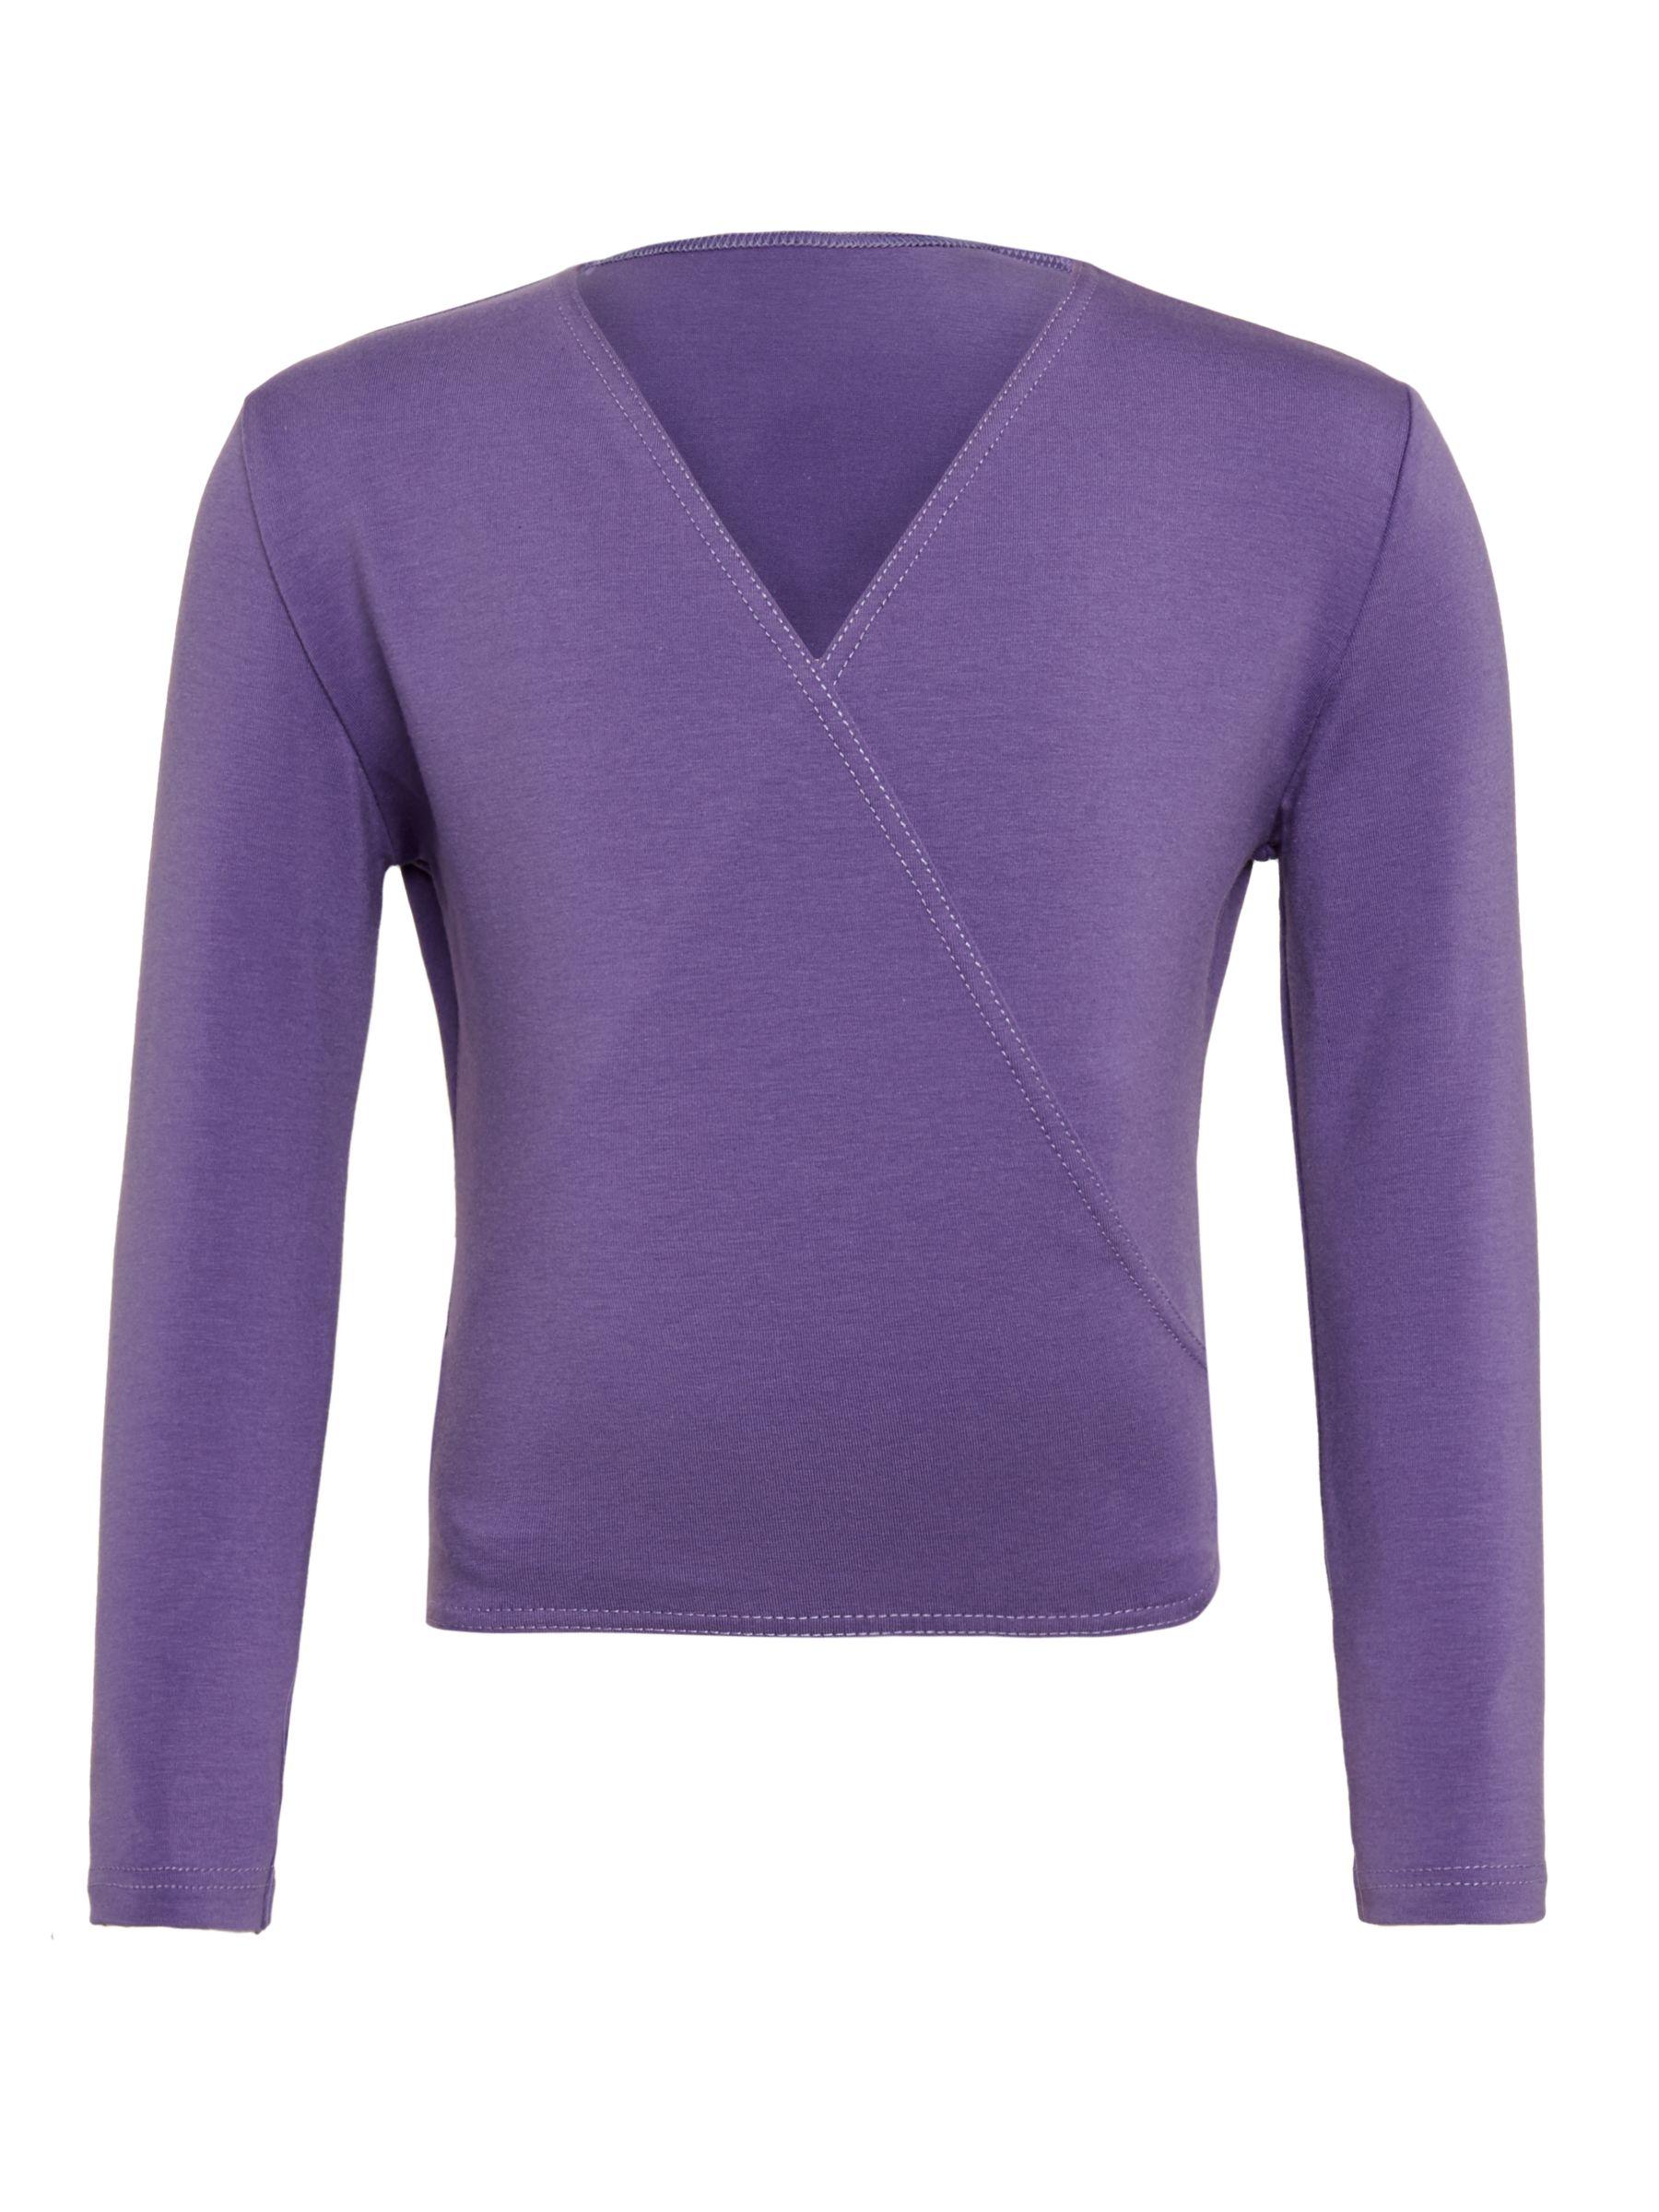 Freed Dancewear Freed Royal Academy of Dance Crossover 3/4 Sleeves Wrap Cardigan, Purple